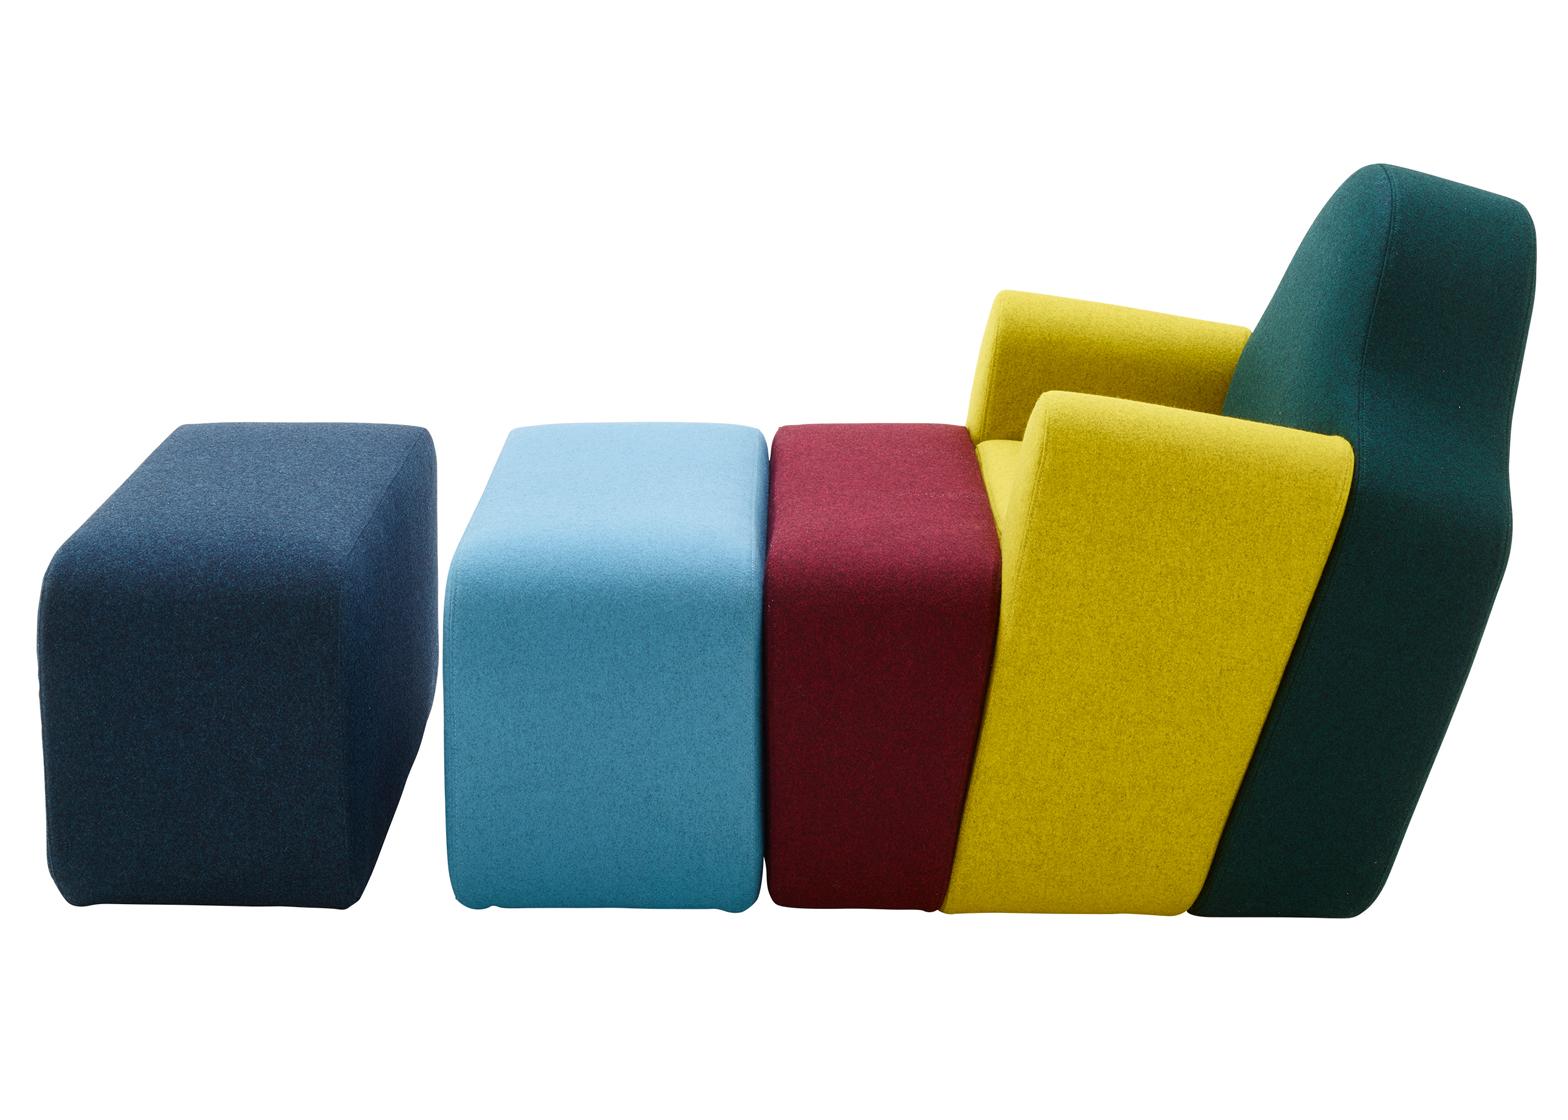 slice-chair-pierre-charpin-cinna-maison-objet_dezeen_ban